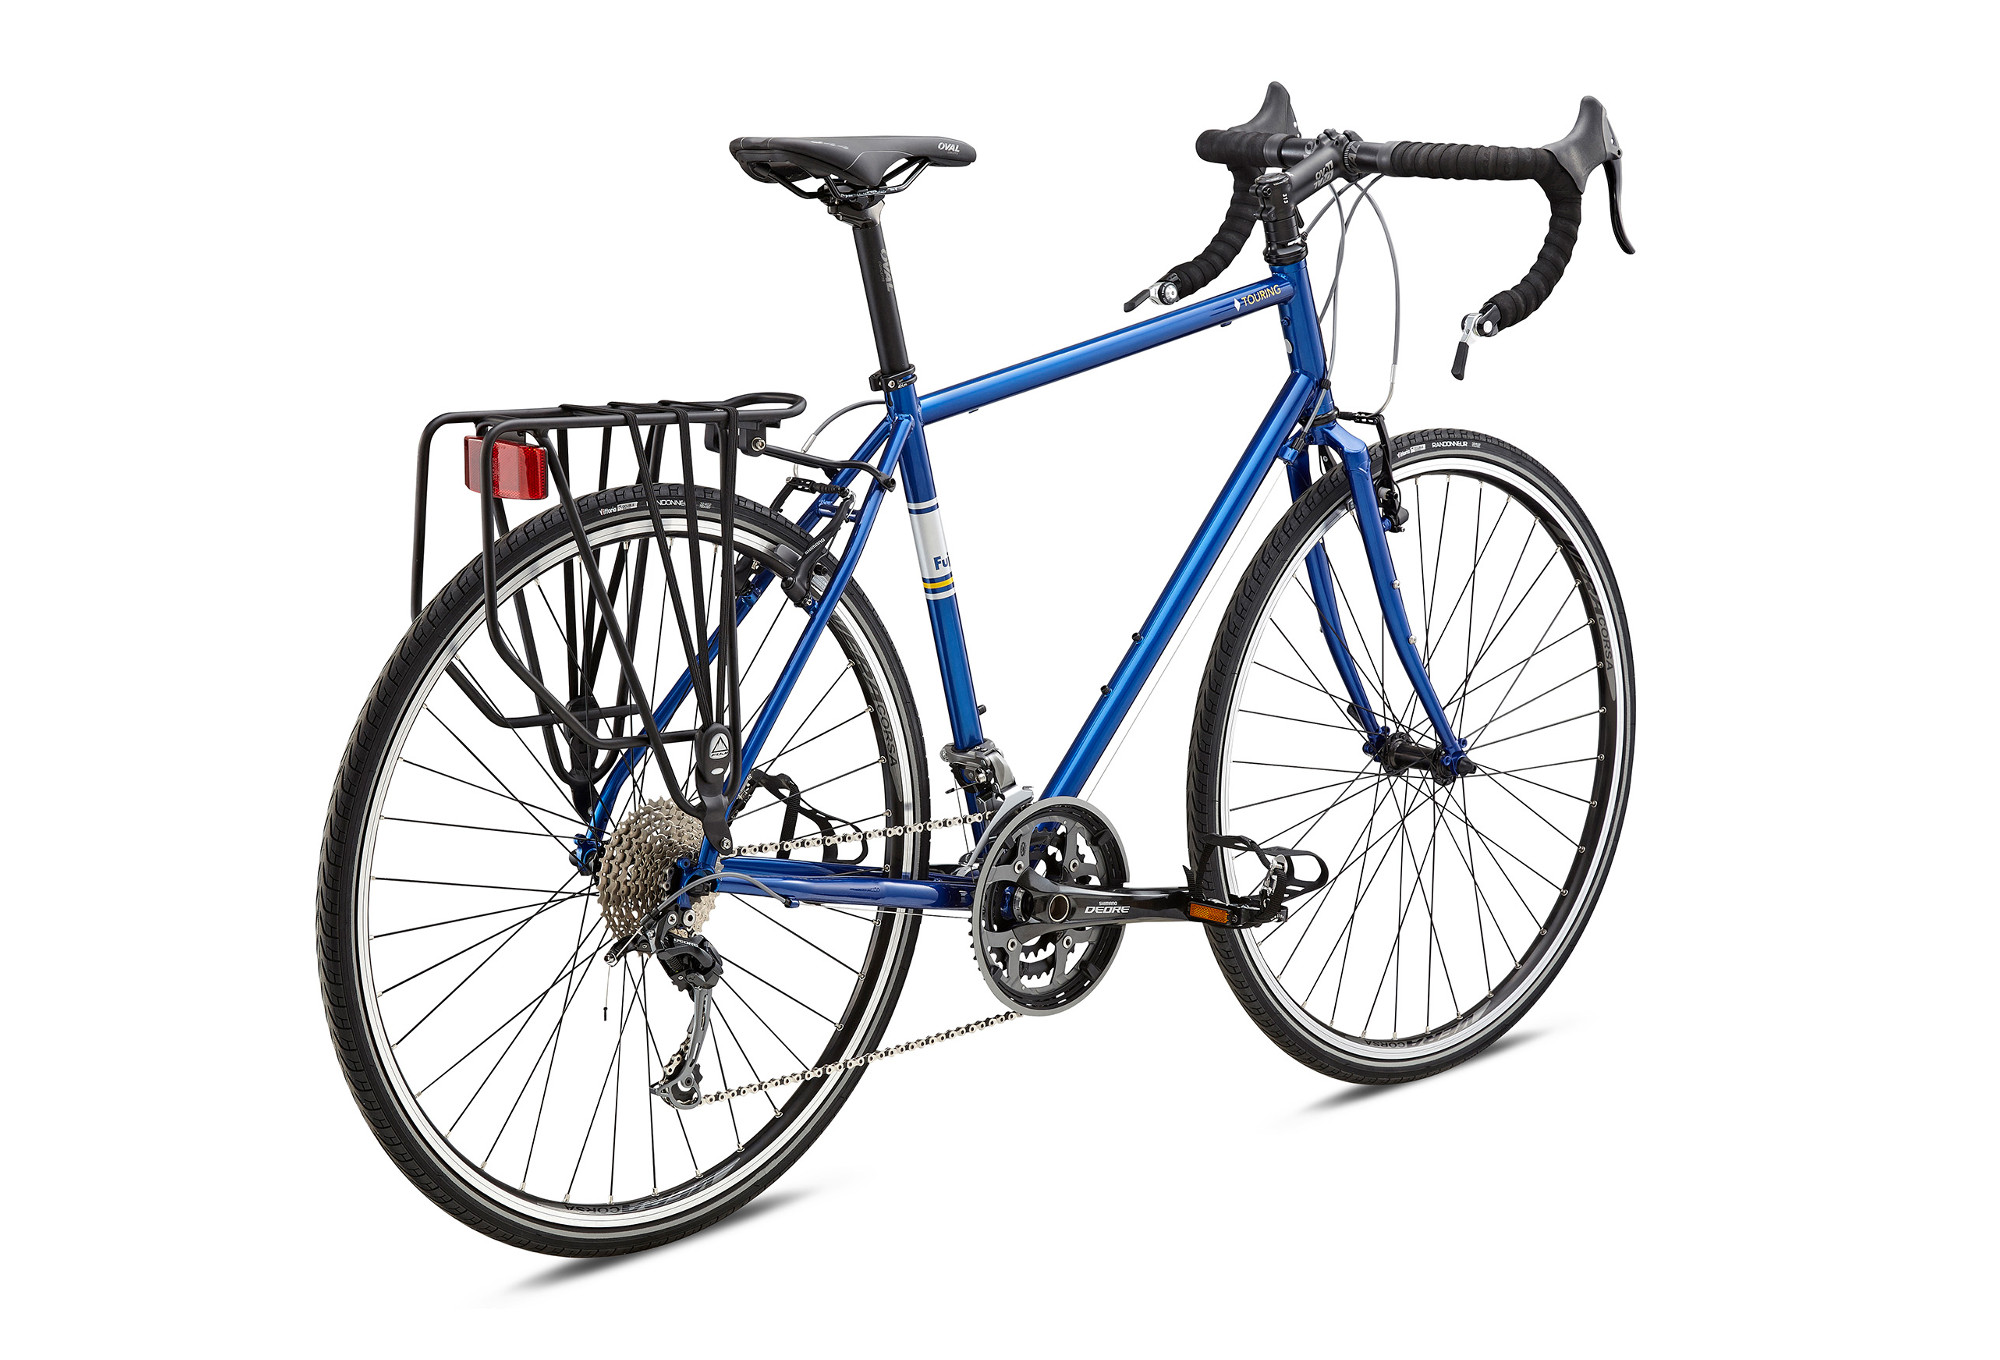 Travel Bike FUJI 2018 TOURING Shimano Alivio 9s Blue | Alltricks.com